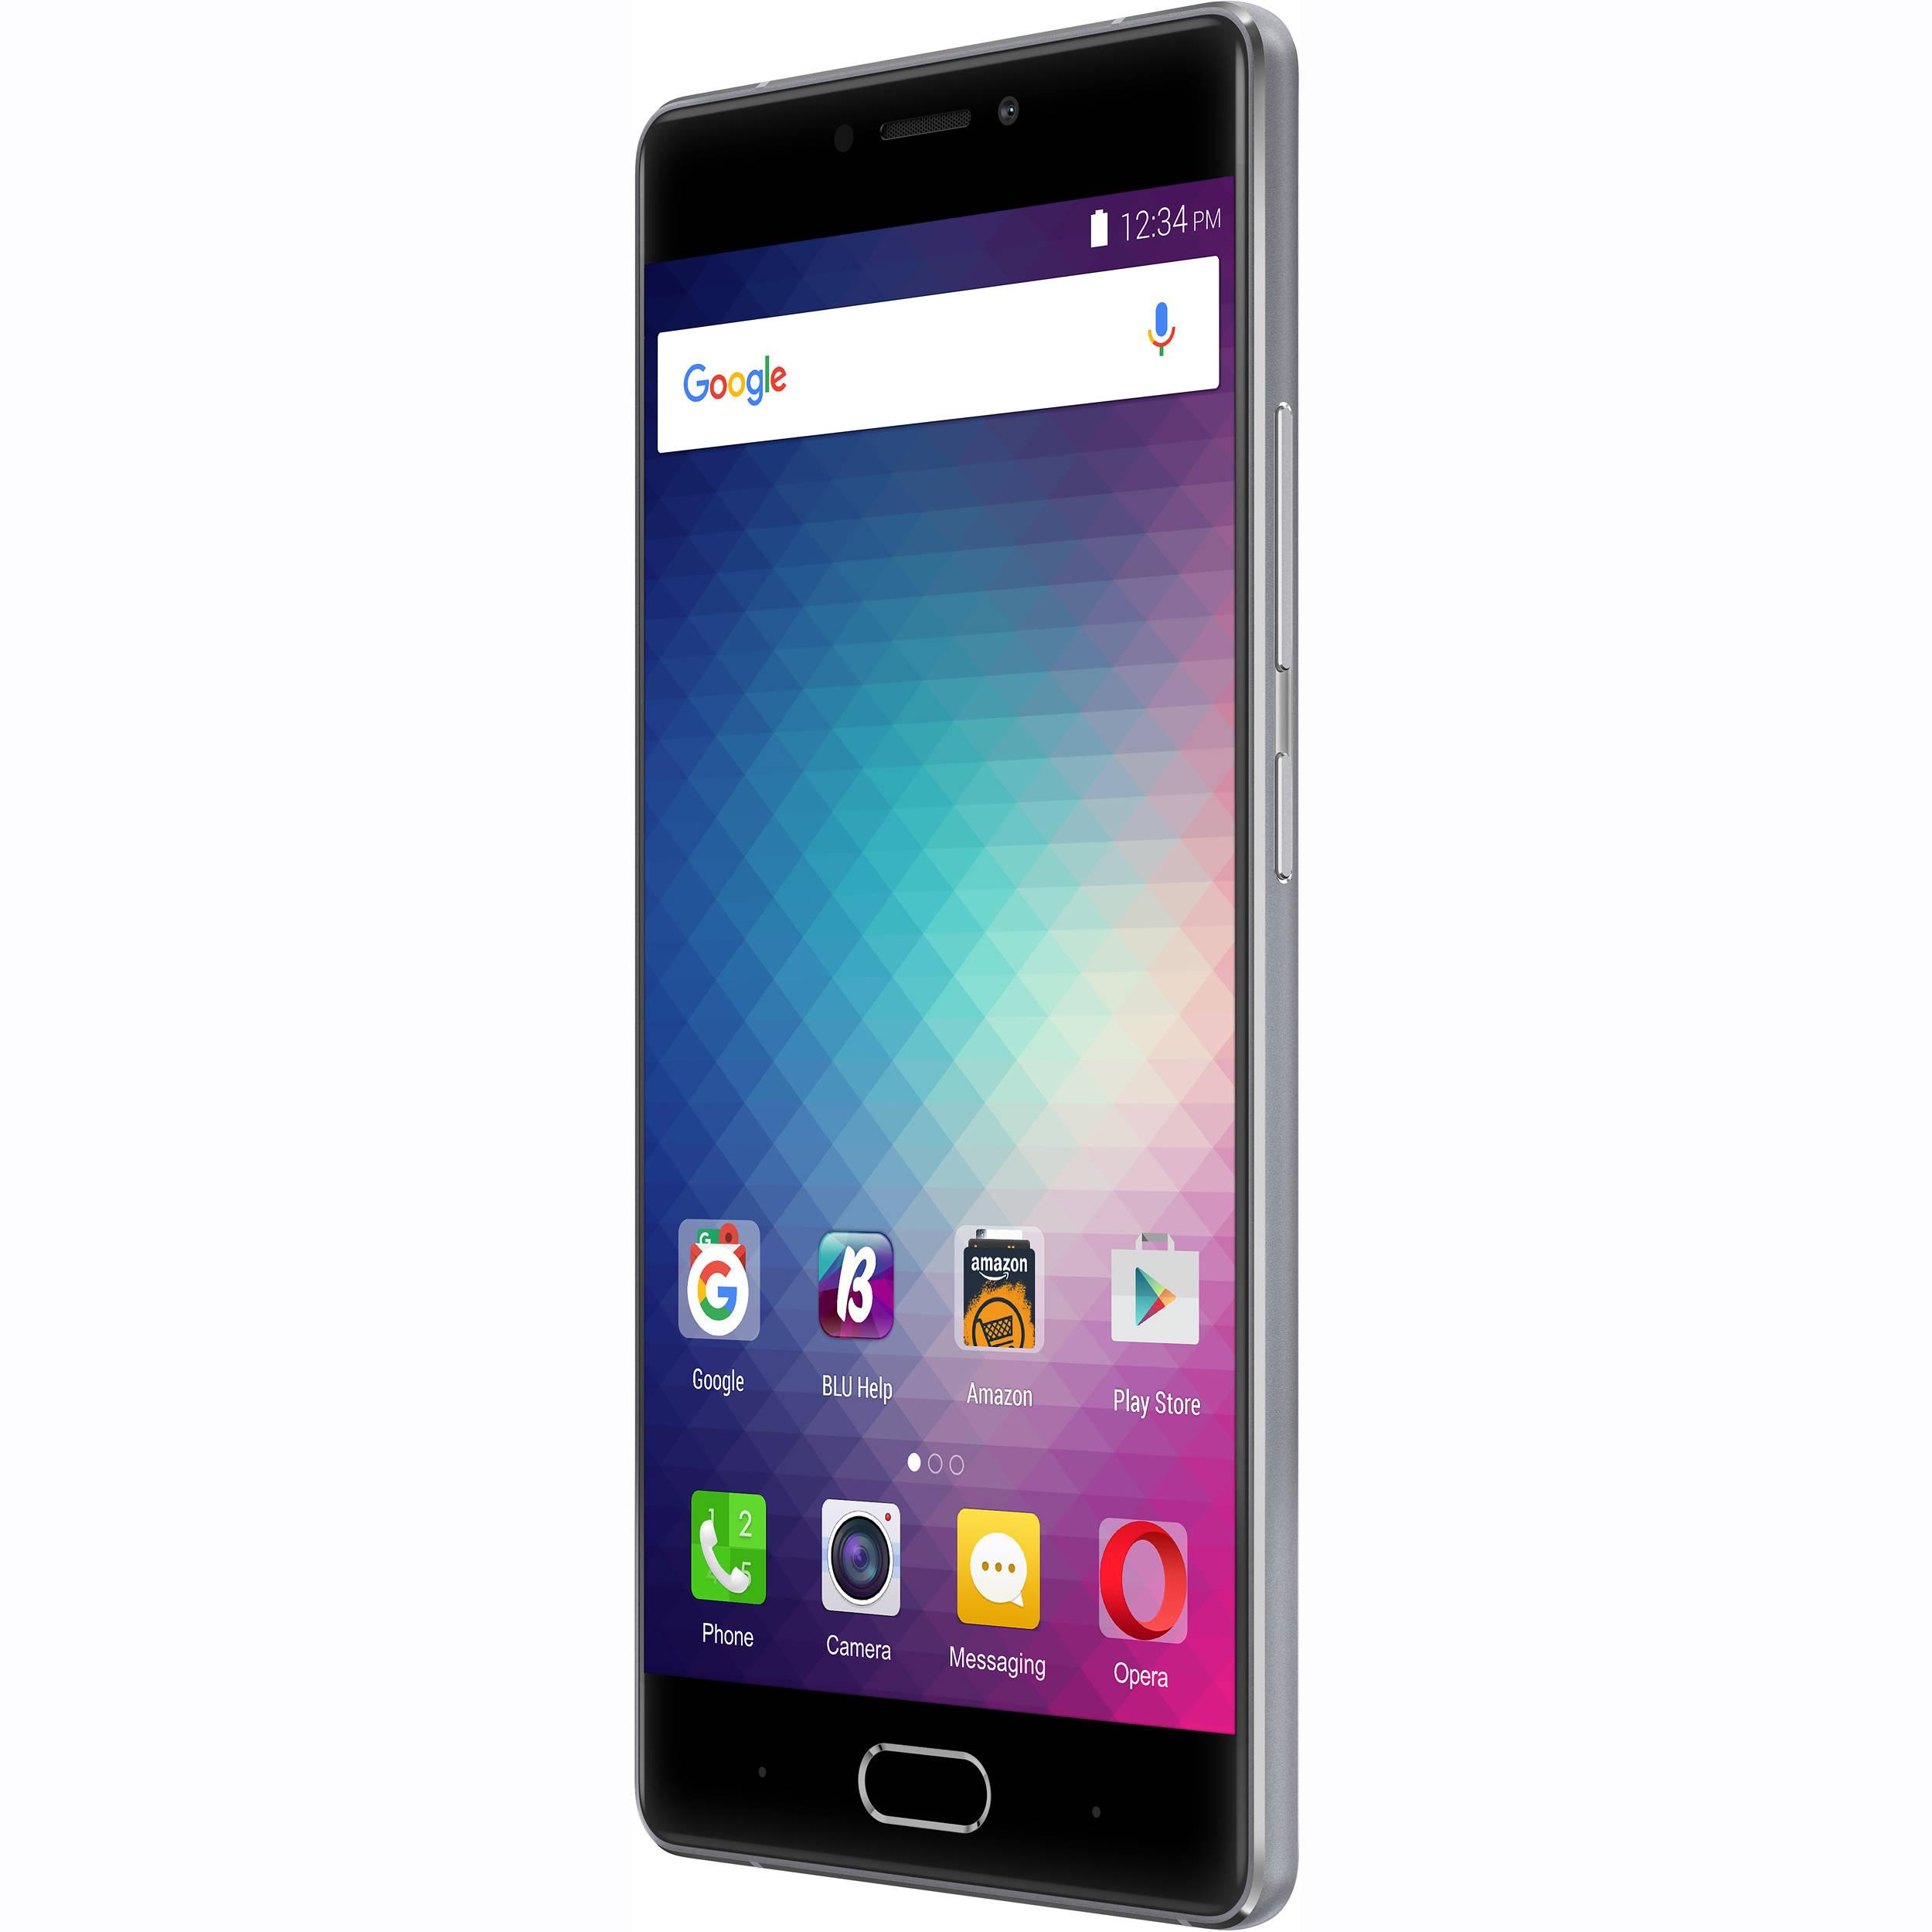 BLU Pure XR P0030UU 64GB Smartphone (Unlocked, Gray) P0030UU